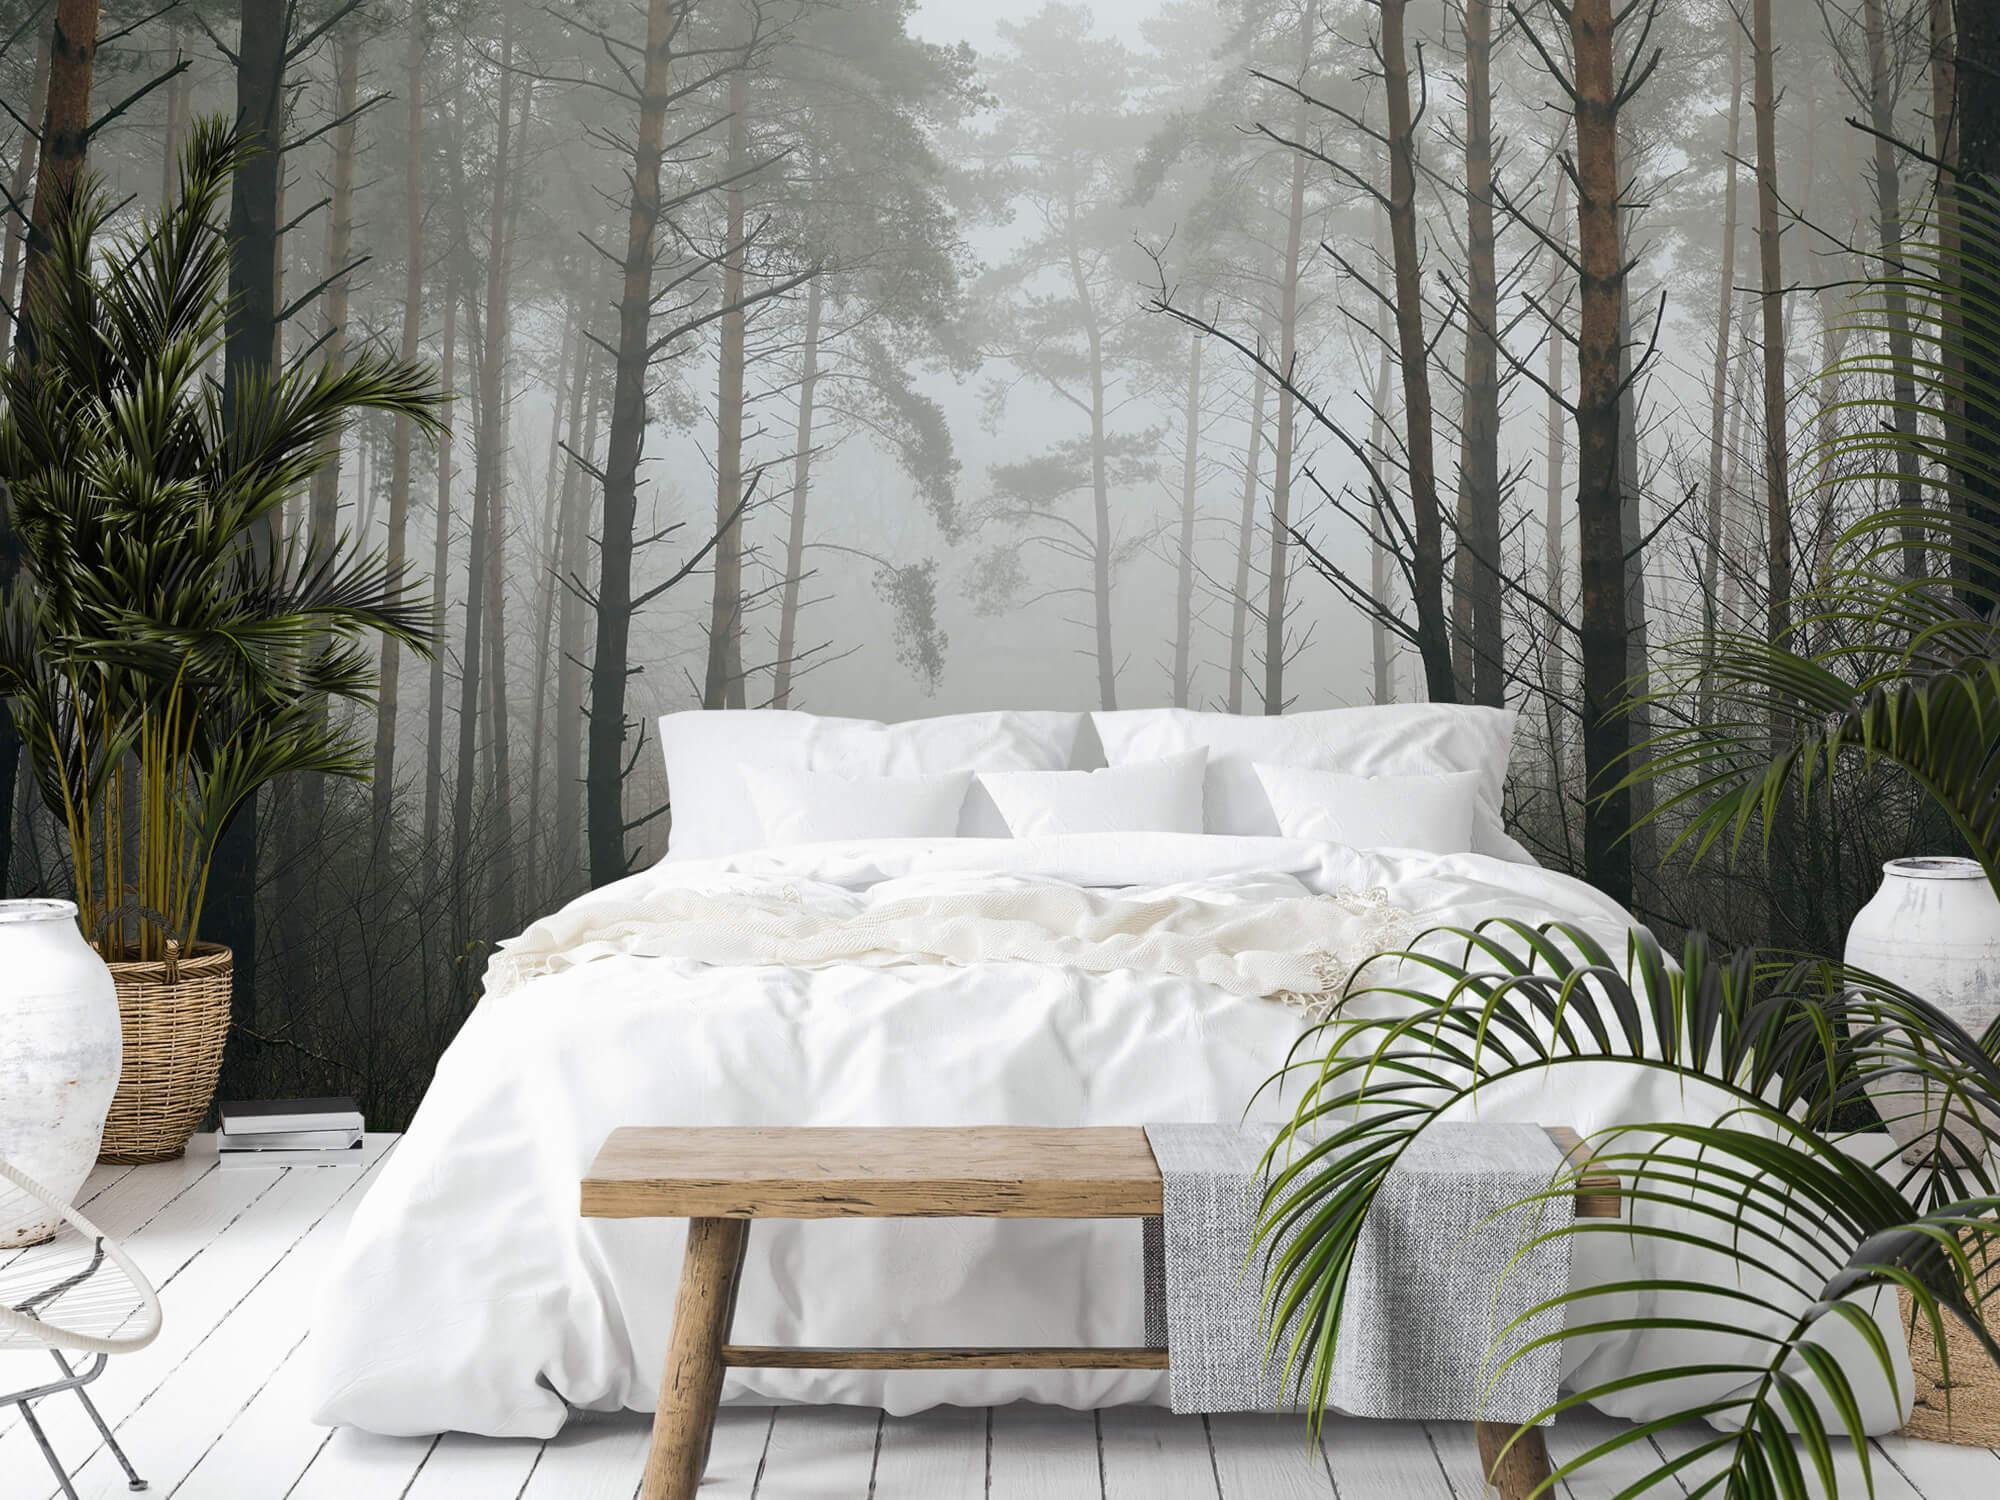 Natuur Pad in mistig bos 7